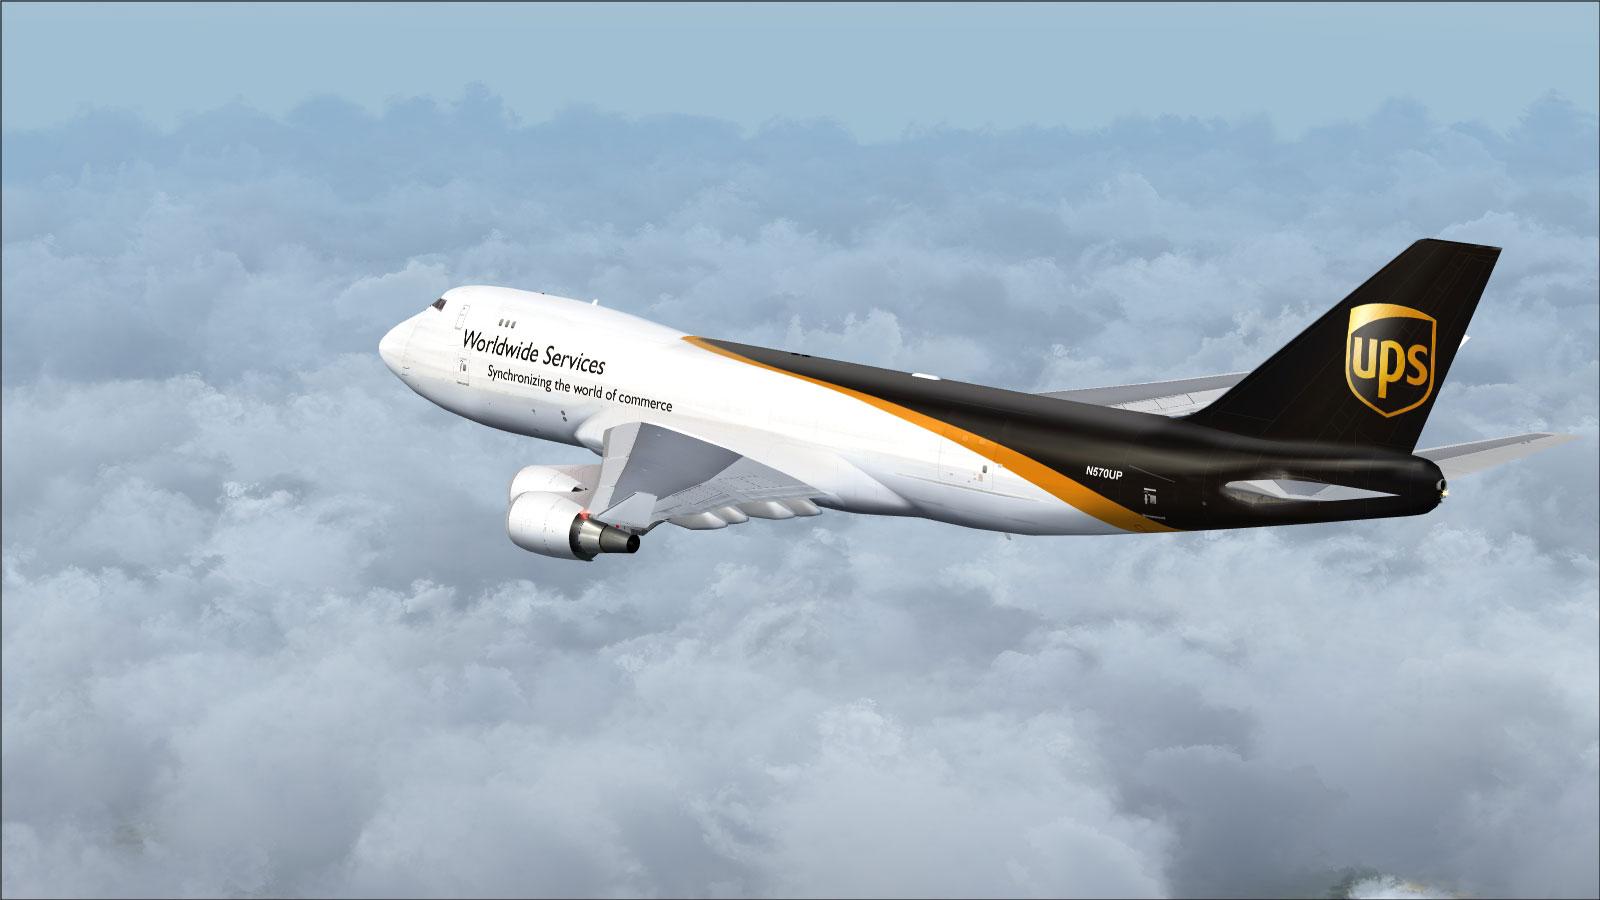 UPS国际快递 UPS假期服务安排 UPS端午服务安排 UPS端午放假安排 UPS快递 国际快递 鹿跃国际快递